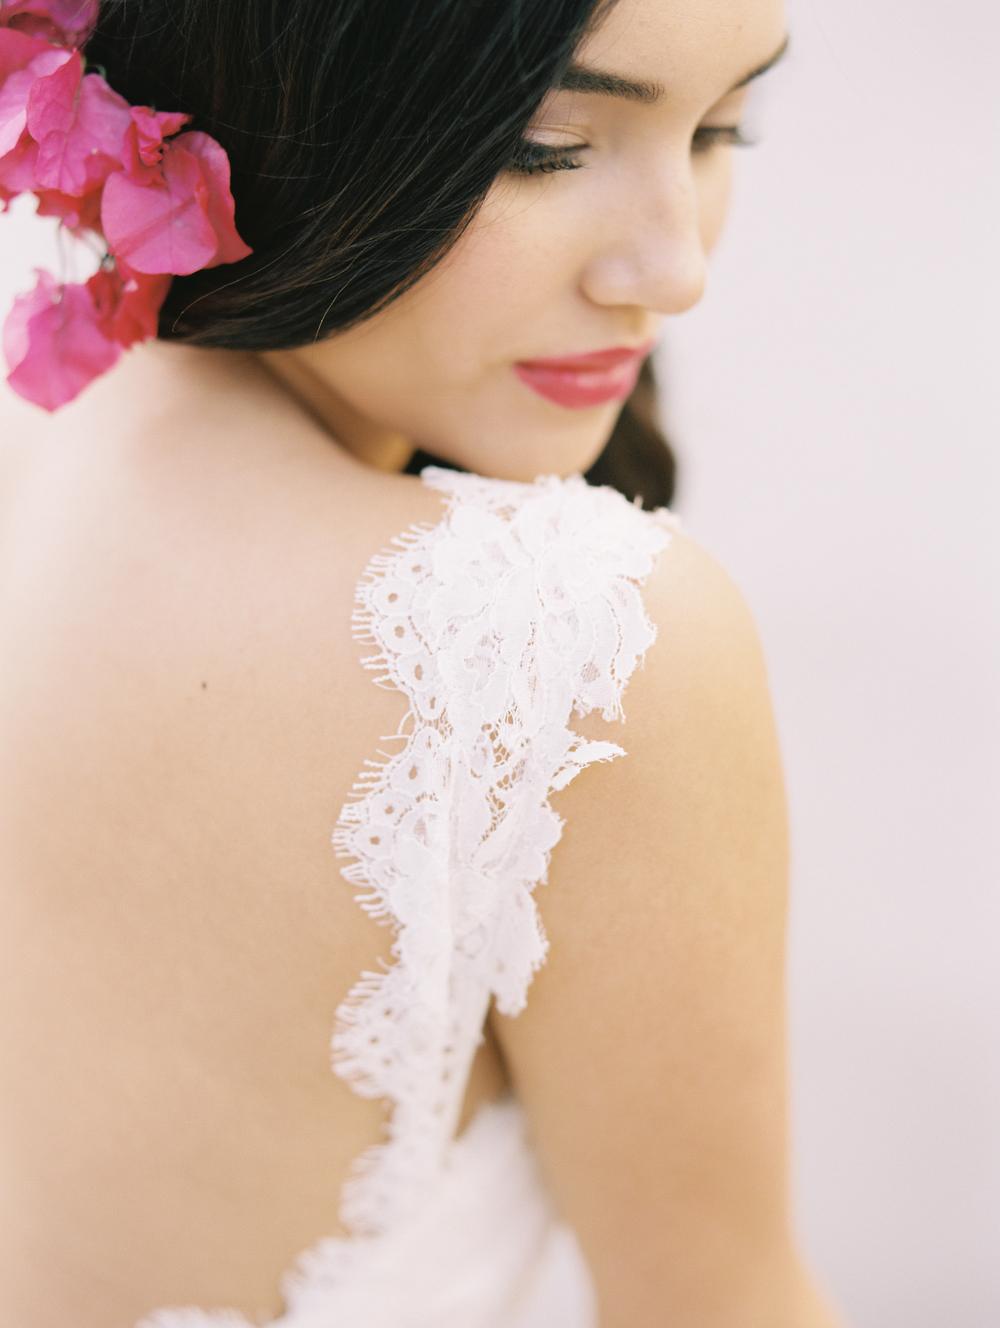 orange county la bridal wedding makeup artist savan photography